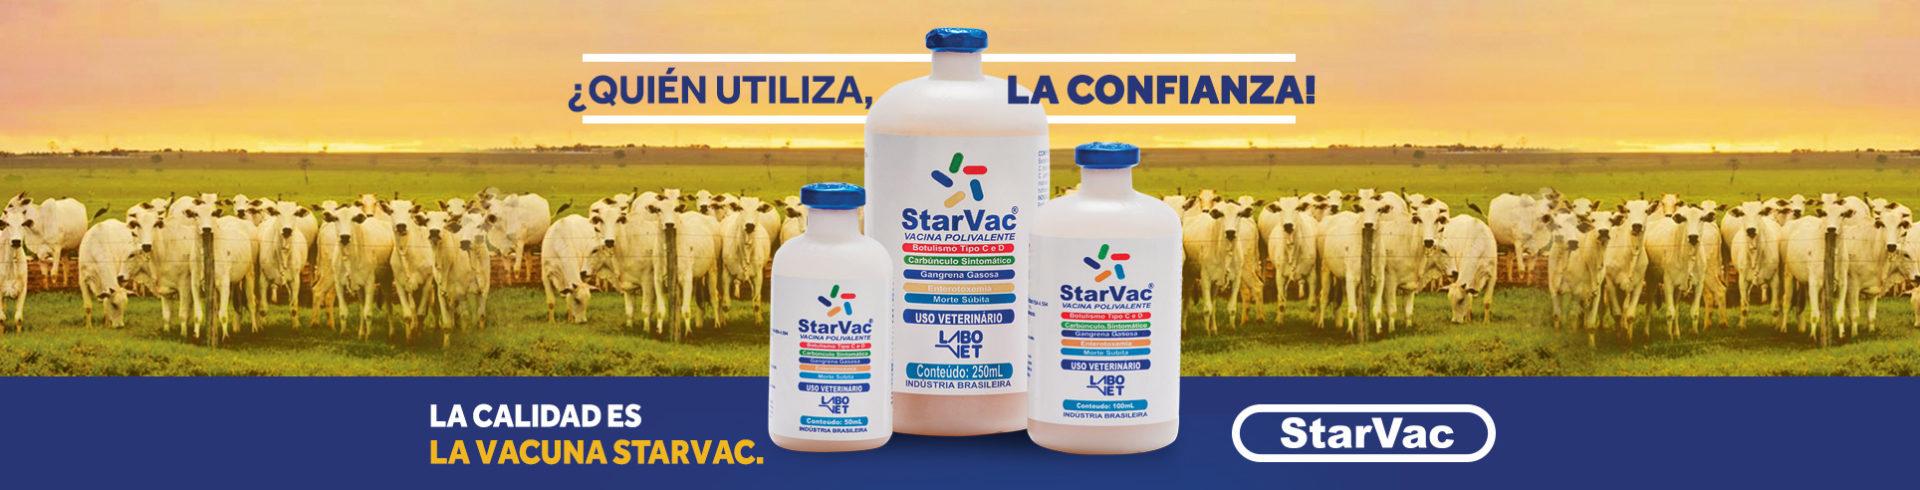 bannersite-starvac-espanhol